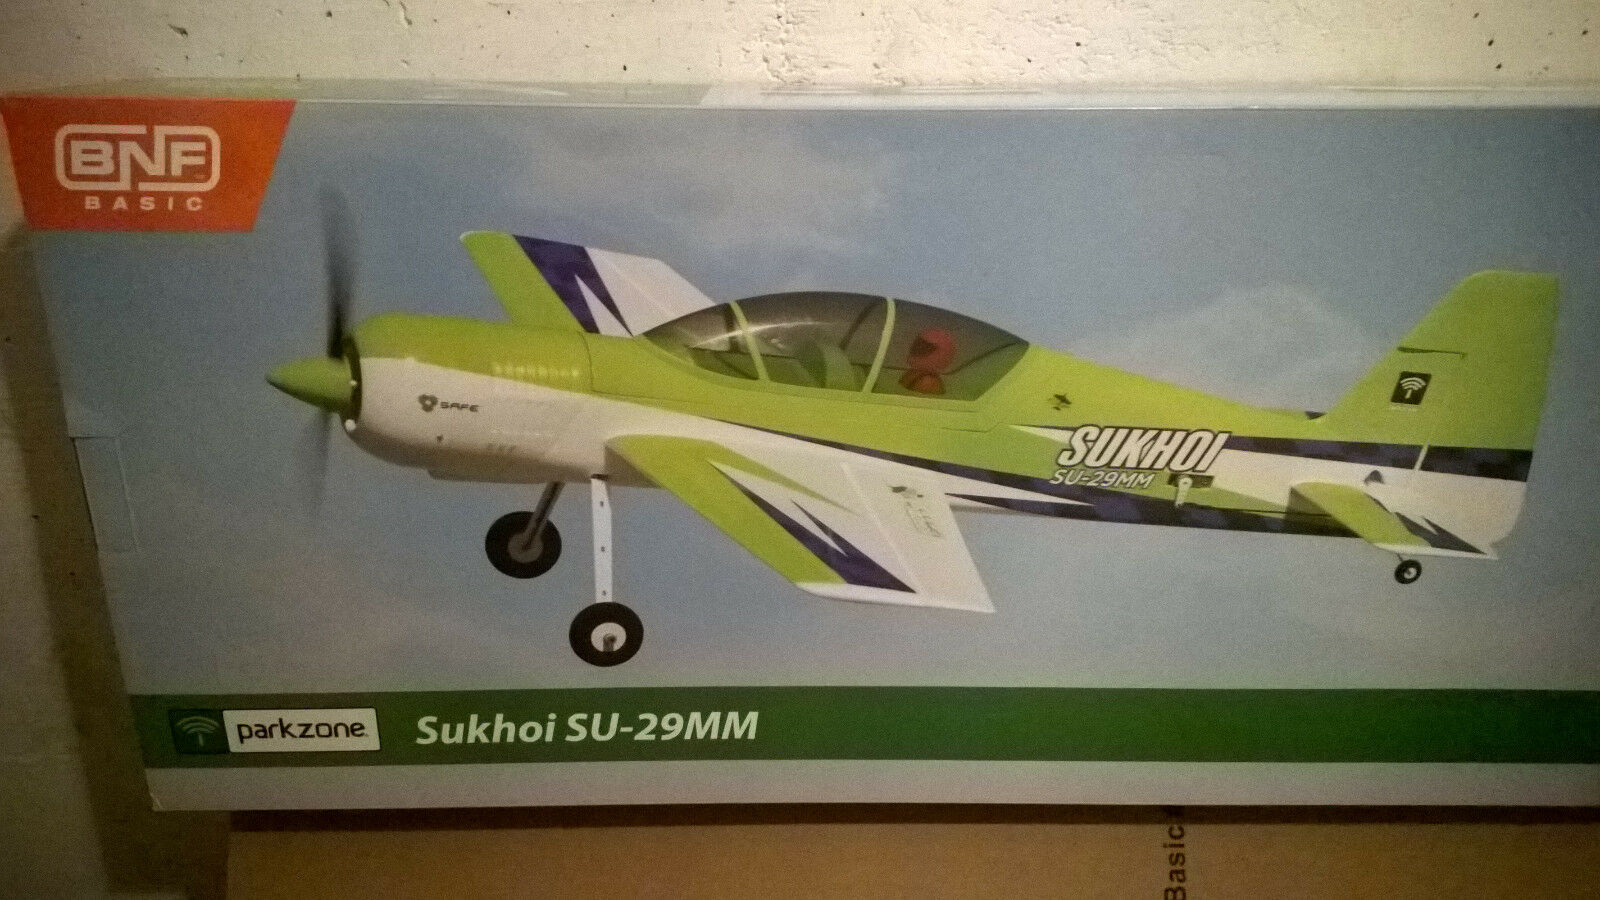 AEREO R C E-flite PARKZONE Sukhoi 26MM BNF BASIC SAFE SYSTEM WITH GYROSCOPE